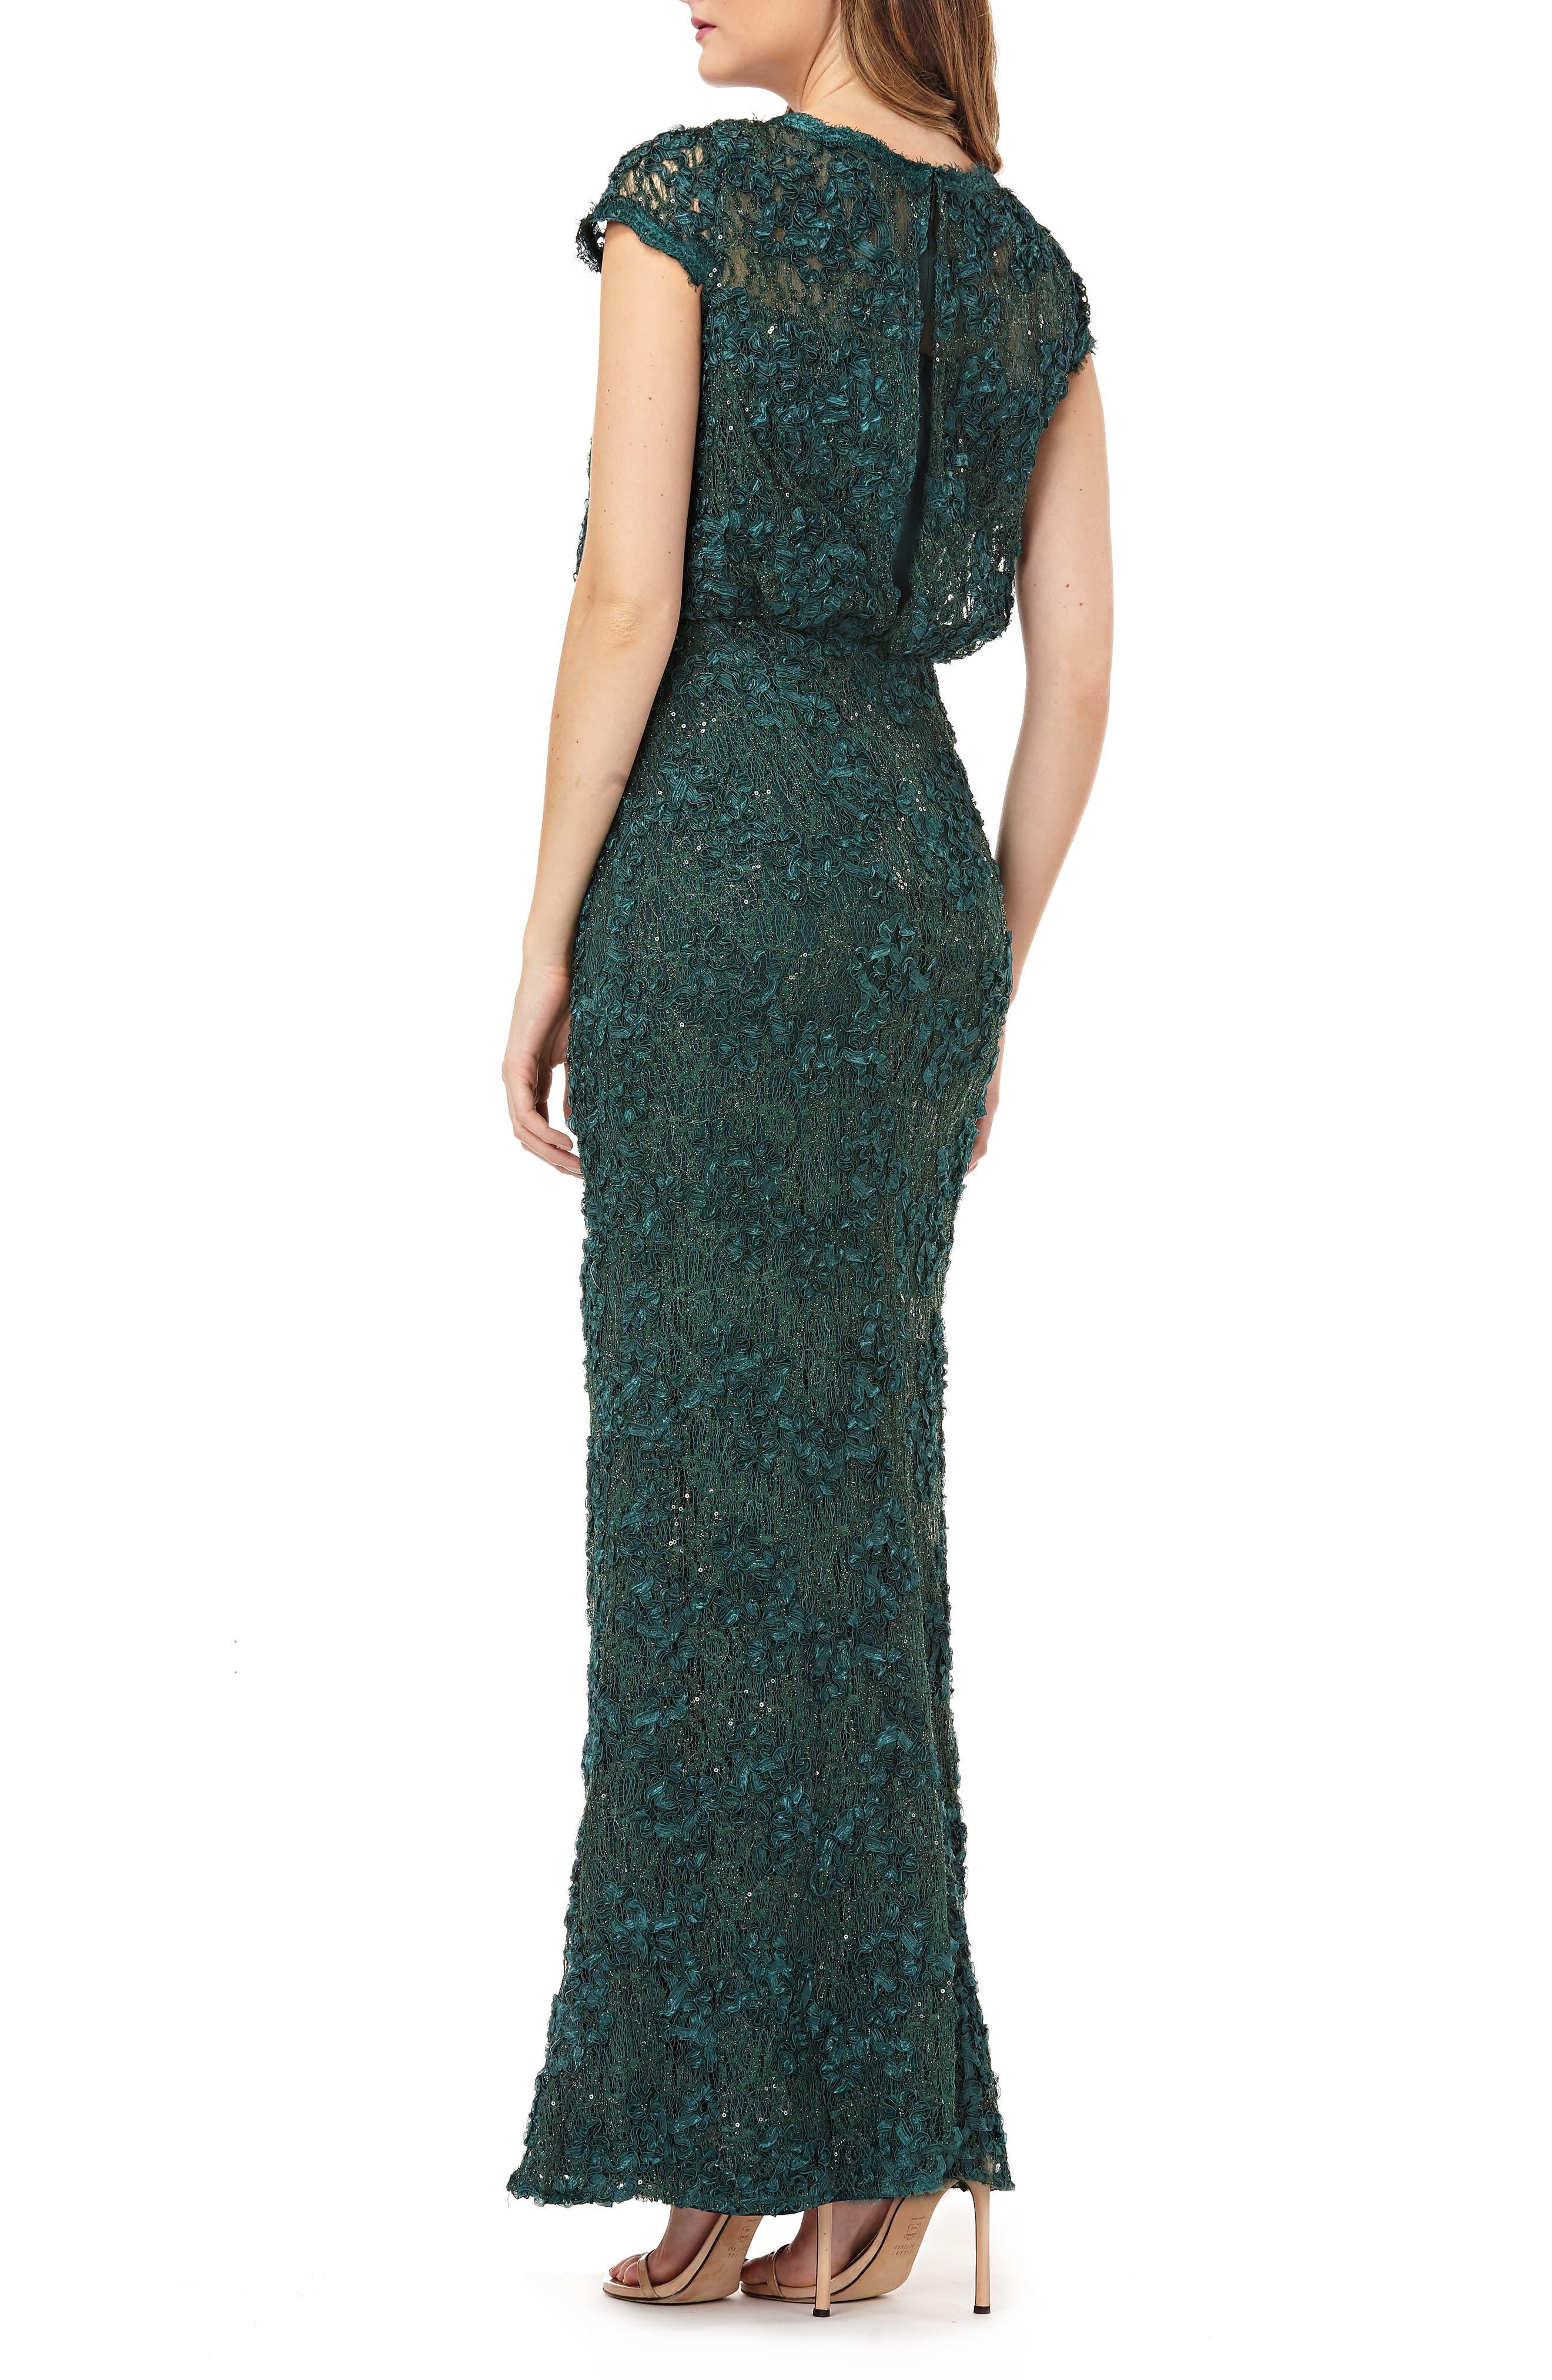 JS COLLECTIONS,                             Sequin Lace Blouson Gown,                             Alternate thumbnail 2, color,                             GREEN